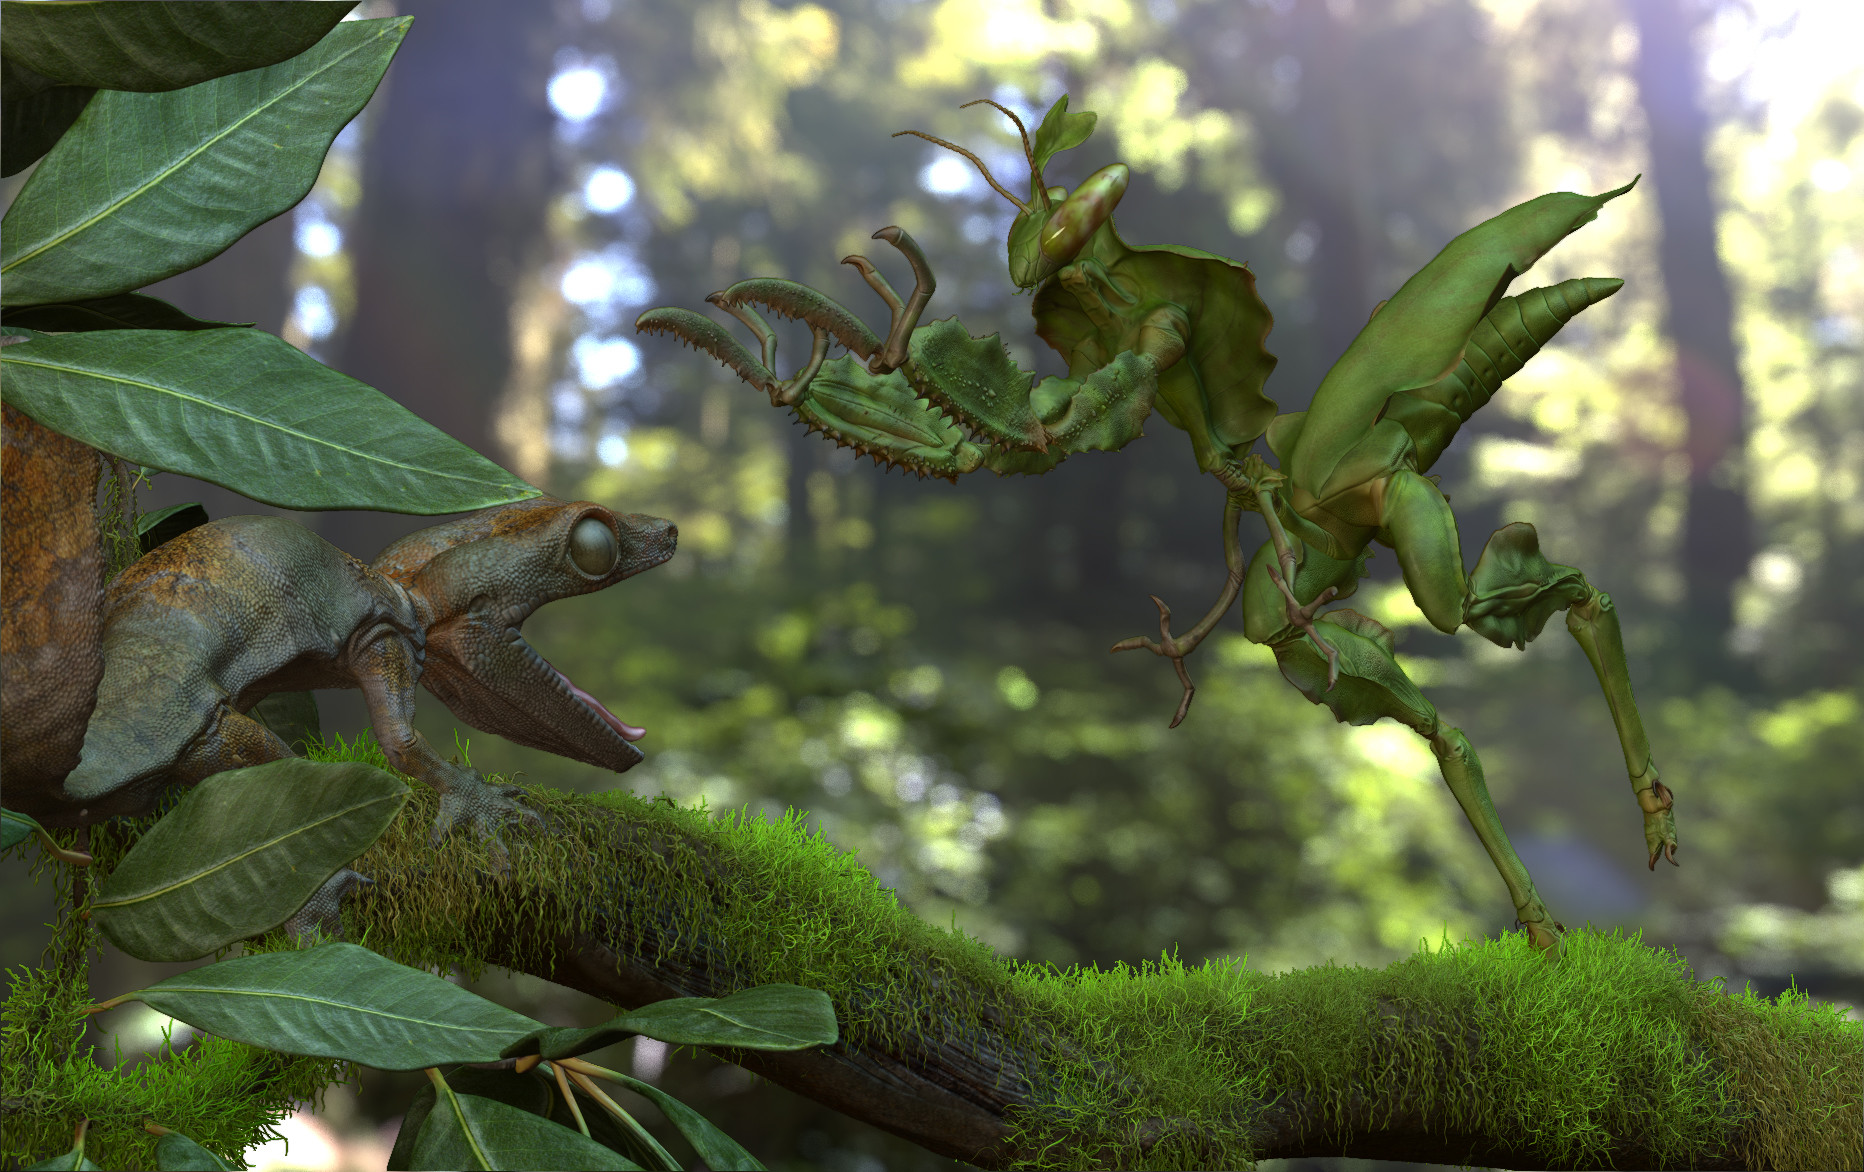 Raptor Mantis Attack